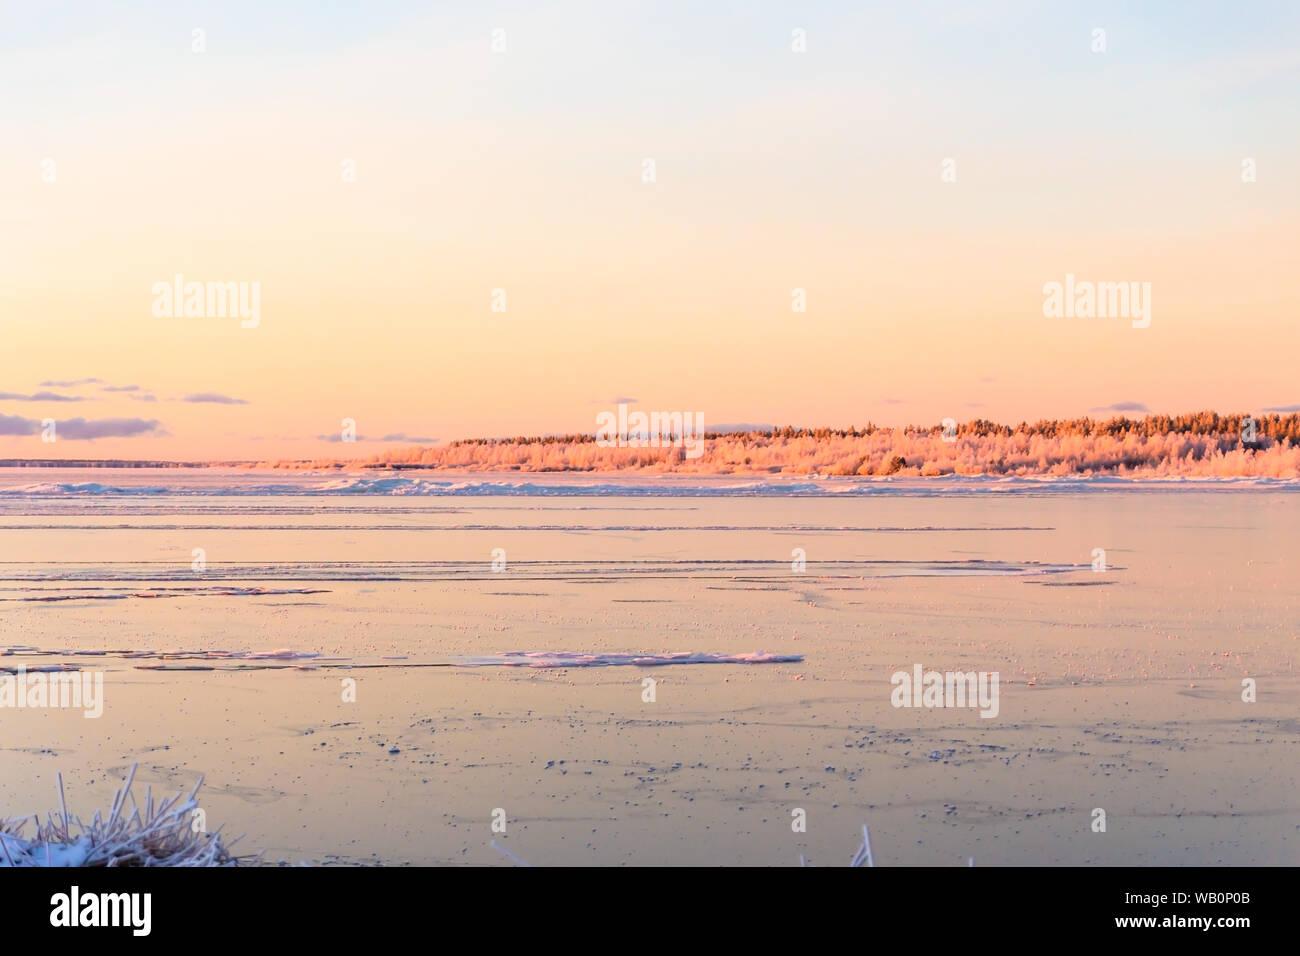 Winter time sea is frozen and frosty beach landscape,Hailuoto island,Bothnian Bay,North Ostrobothnia, Finland Stock Photo